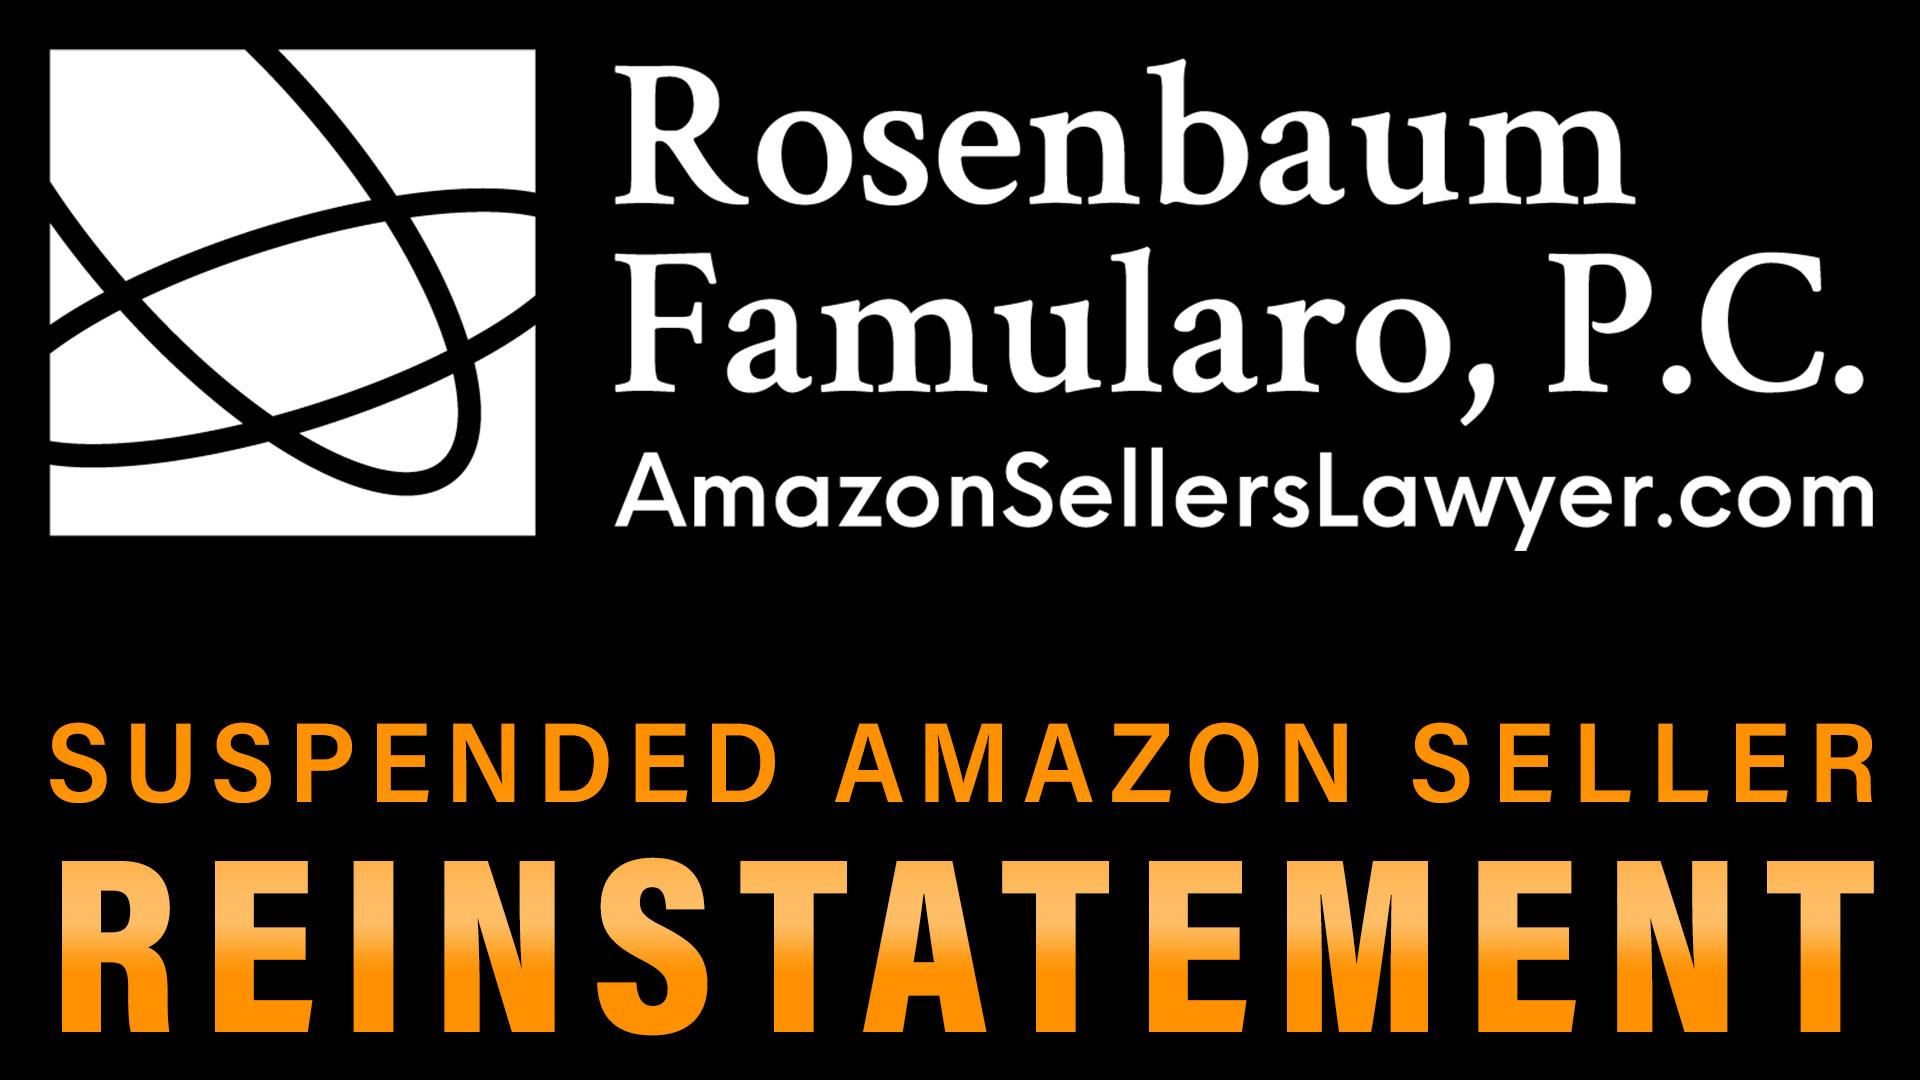 suspended Amazon seller reinstatement